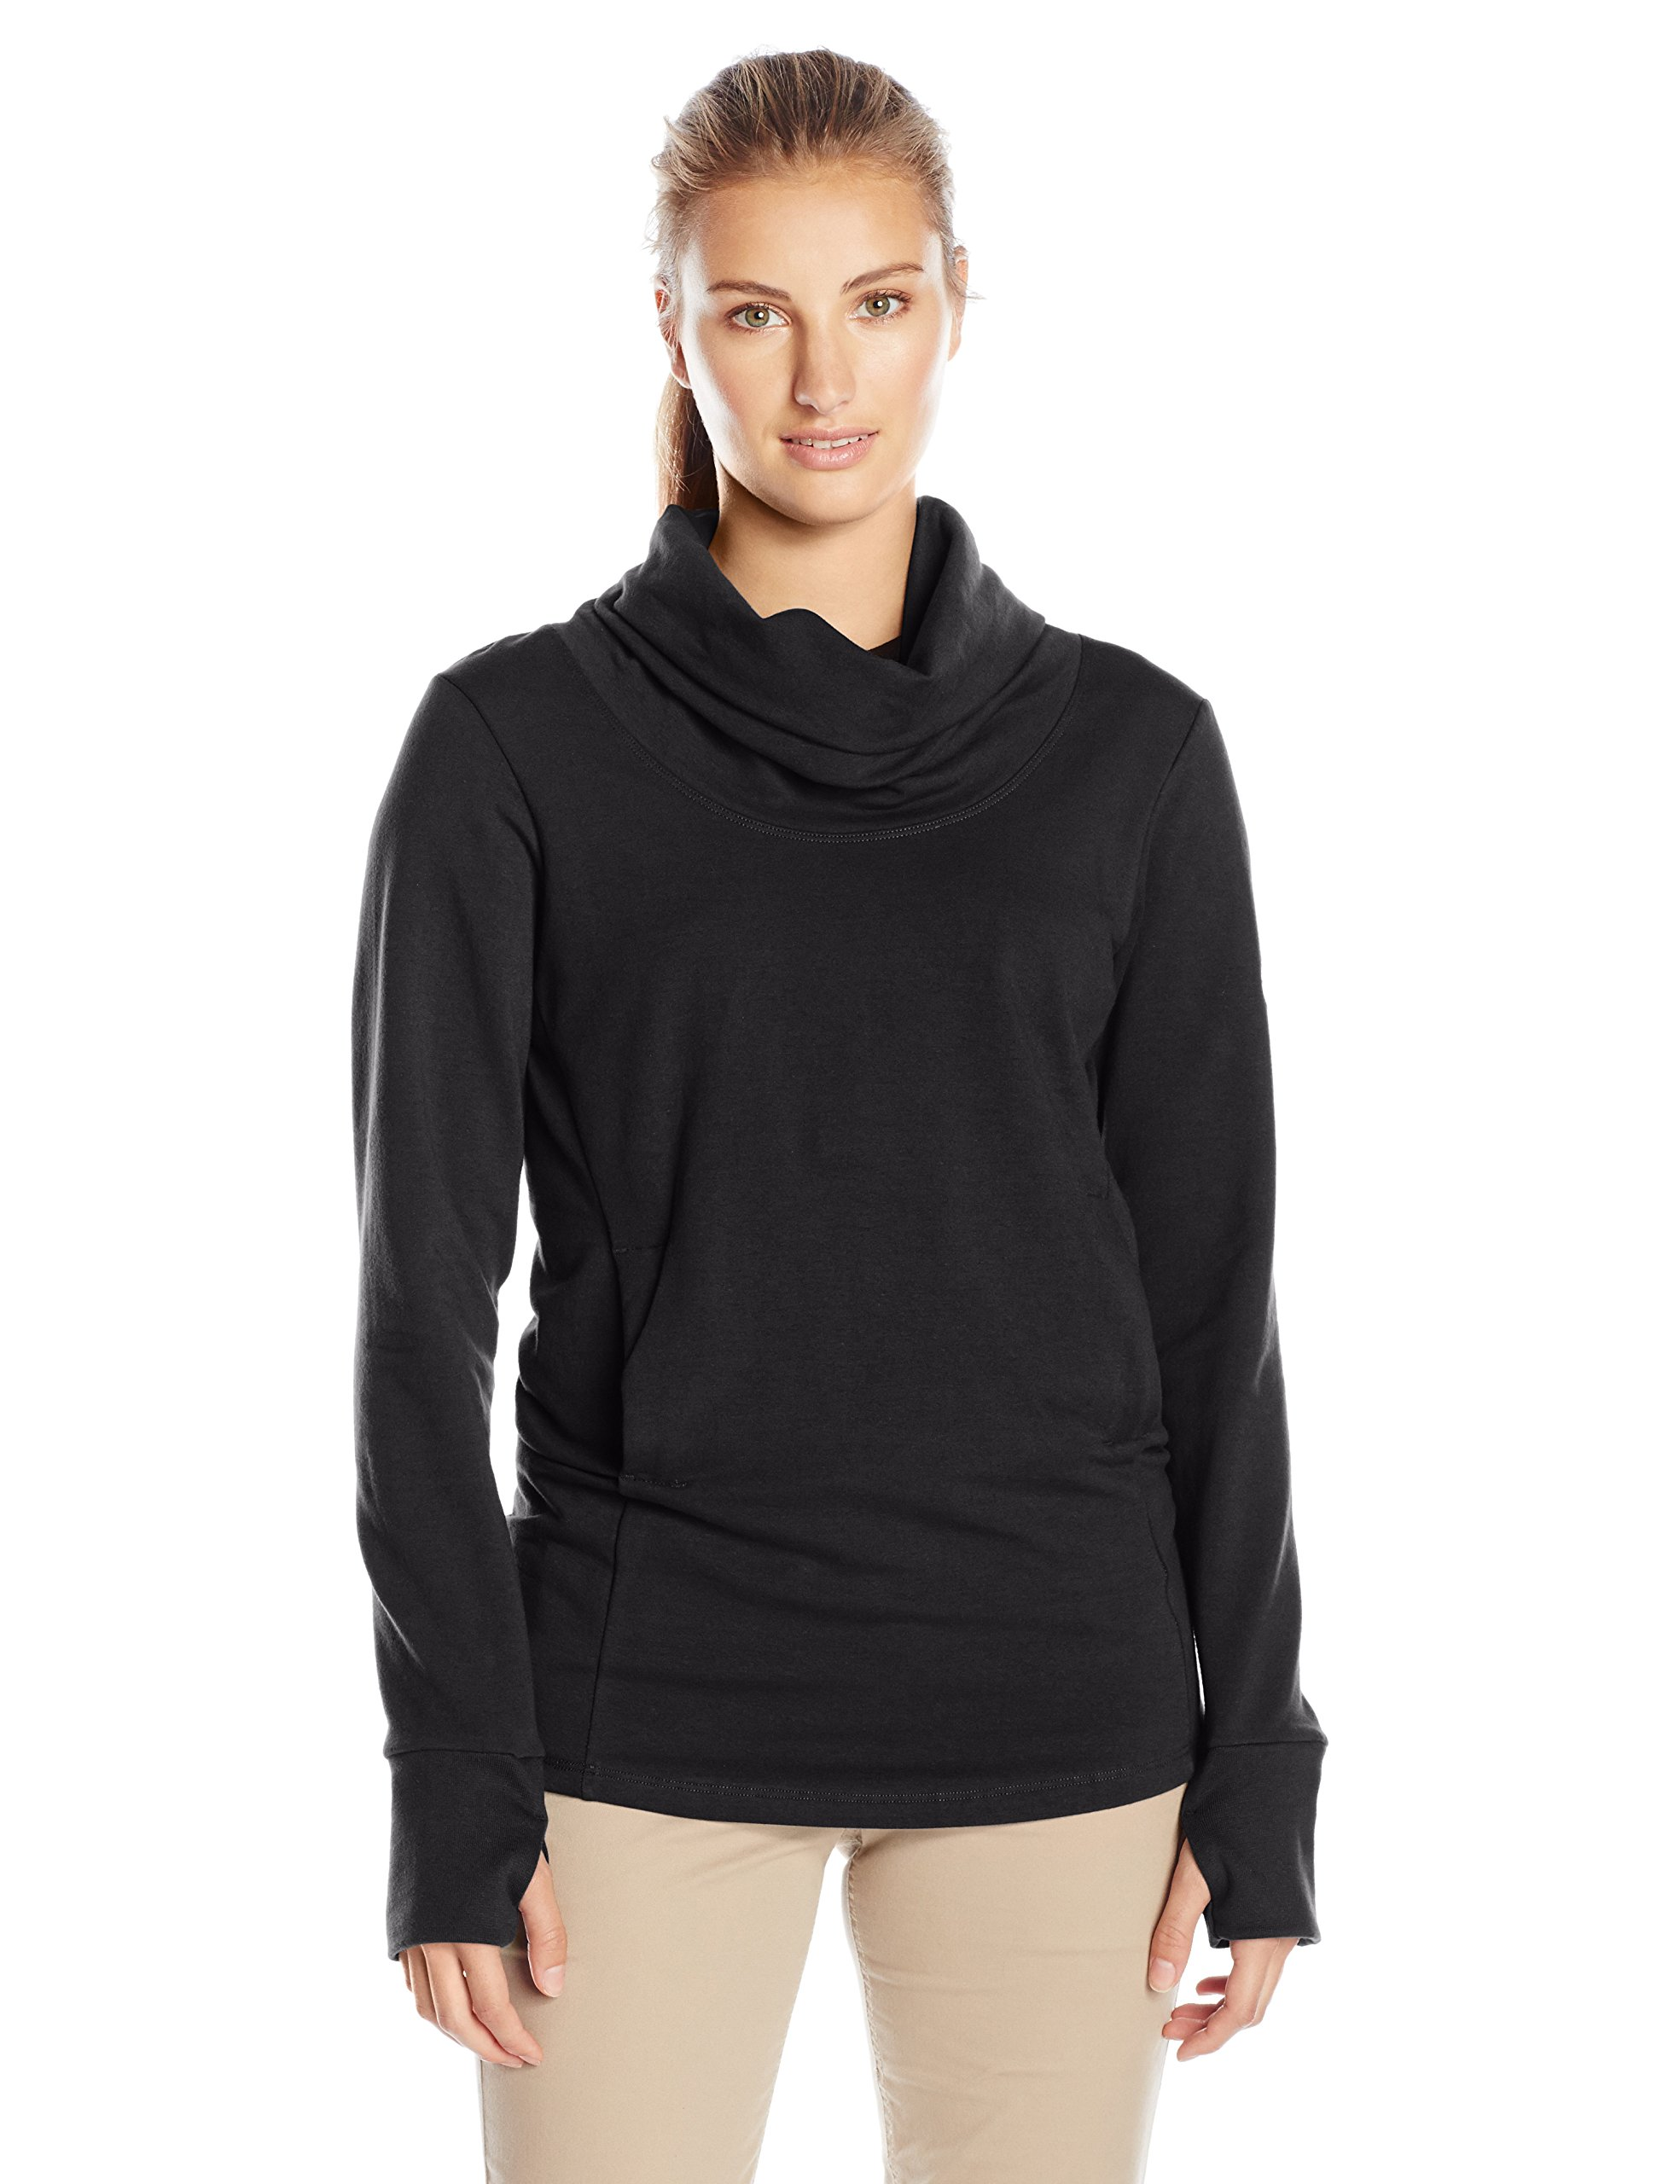 FIG Women's BRU Sweater, Medium, Black